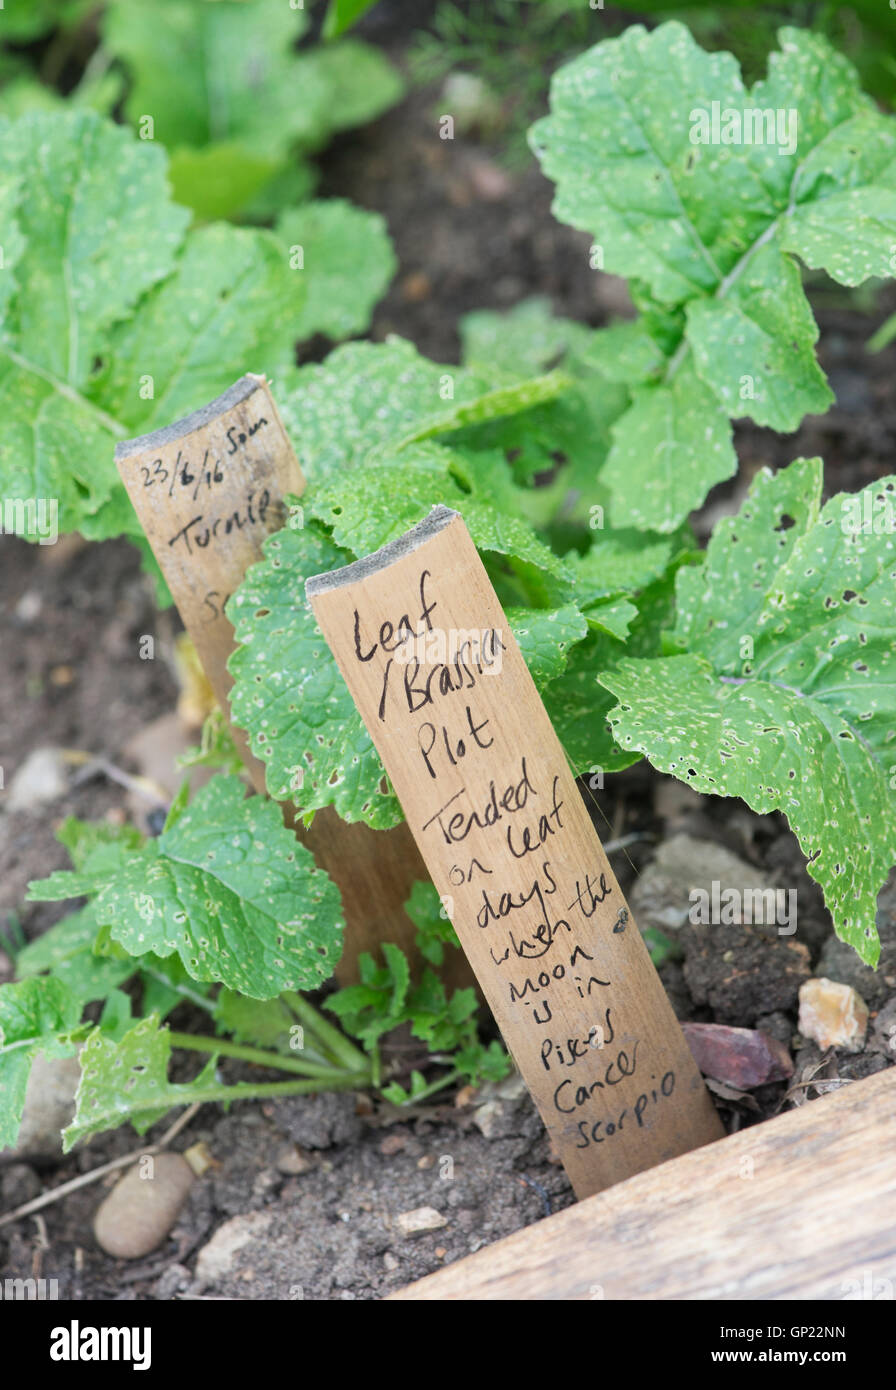 Leaf Brassica plot, Lunar gardening sign at Ryton Organic gardens, Warwickshire, England - Stock Image